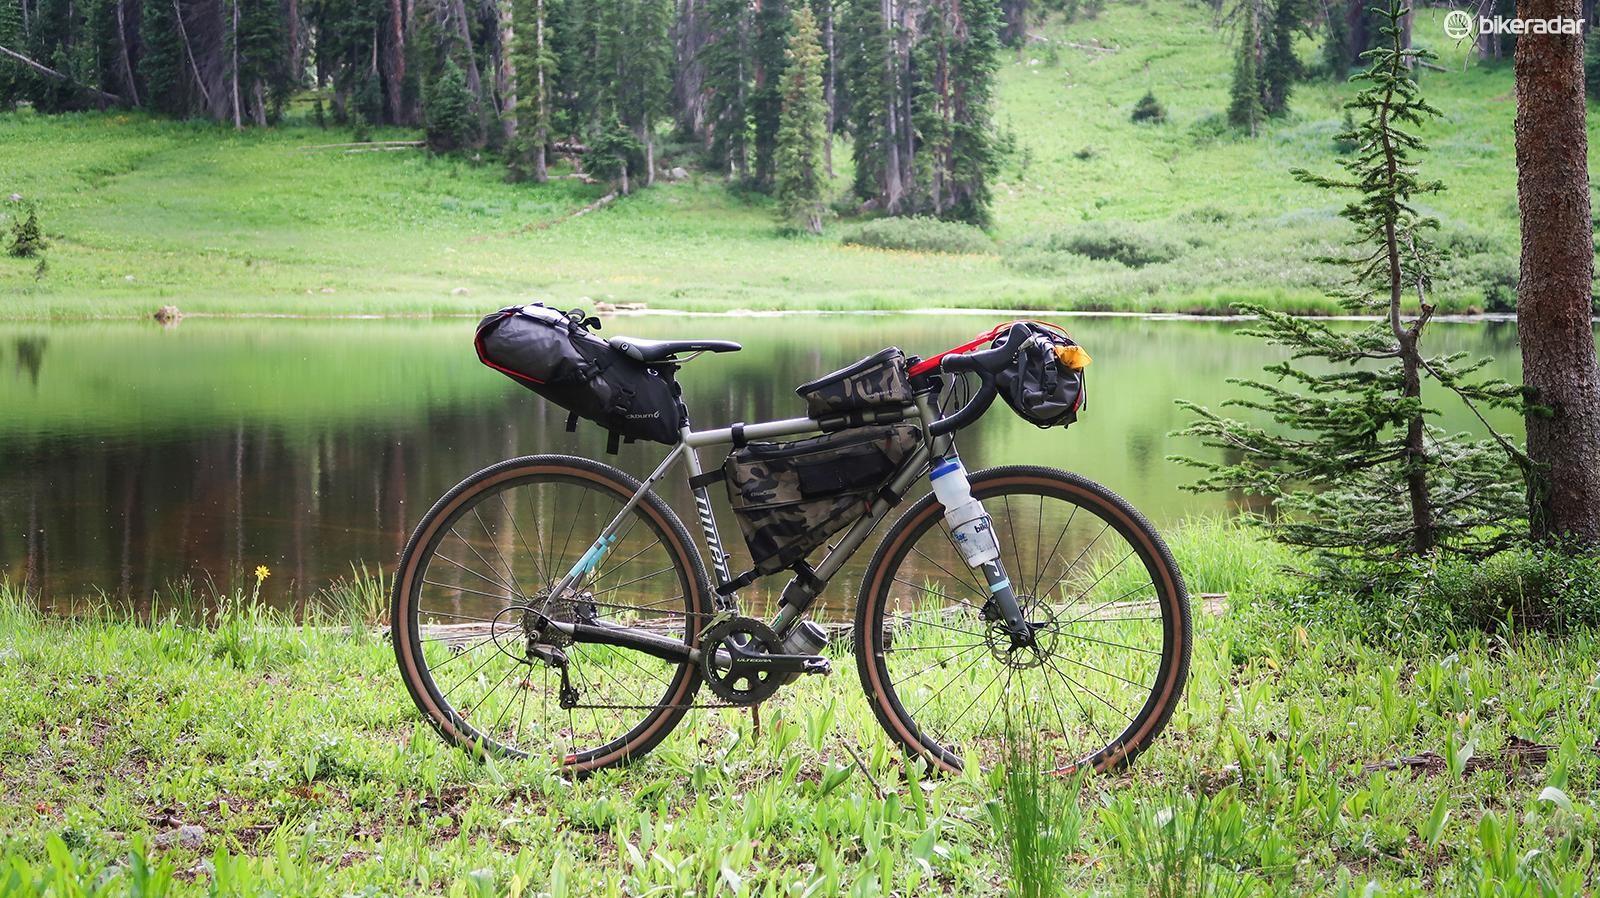 Niner's RLT 9 Steel is a comfortable bikepacking companion